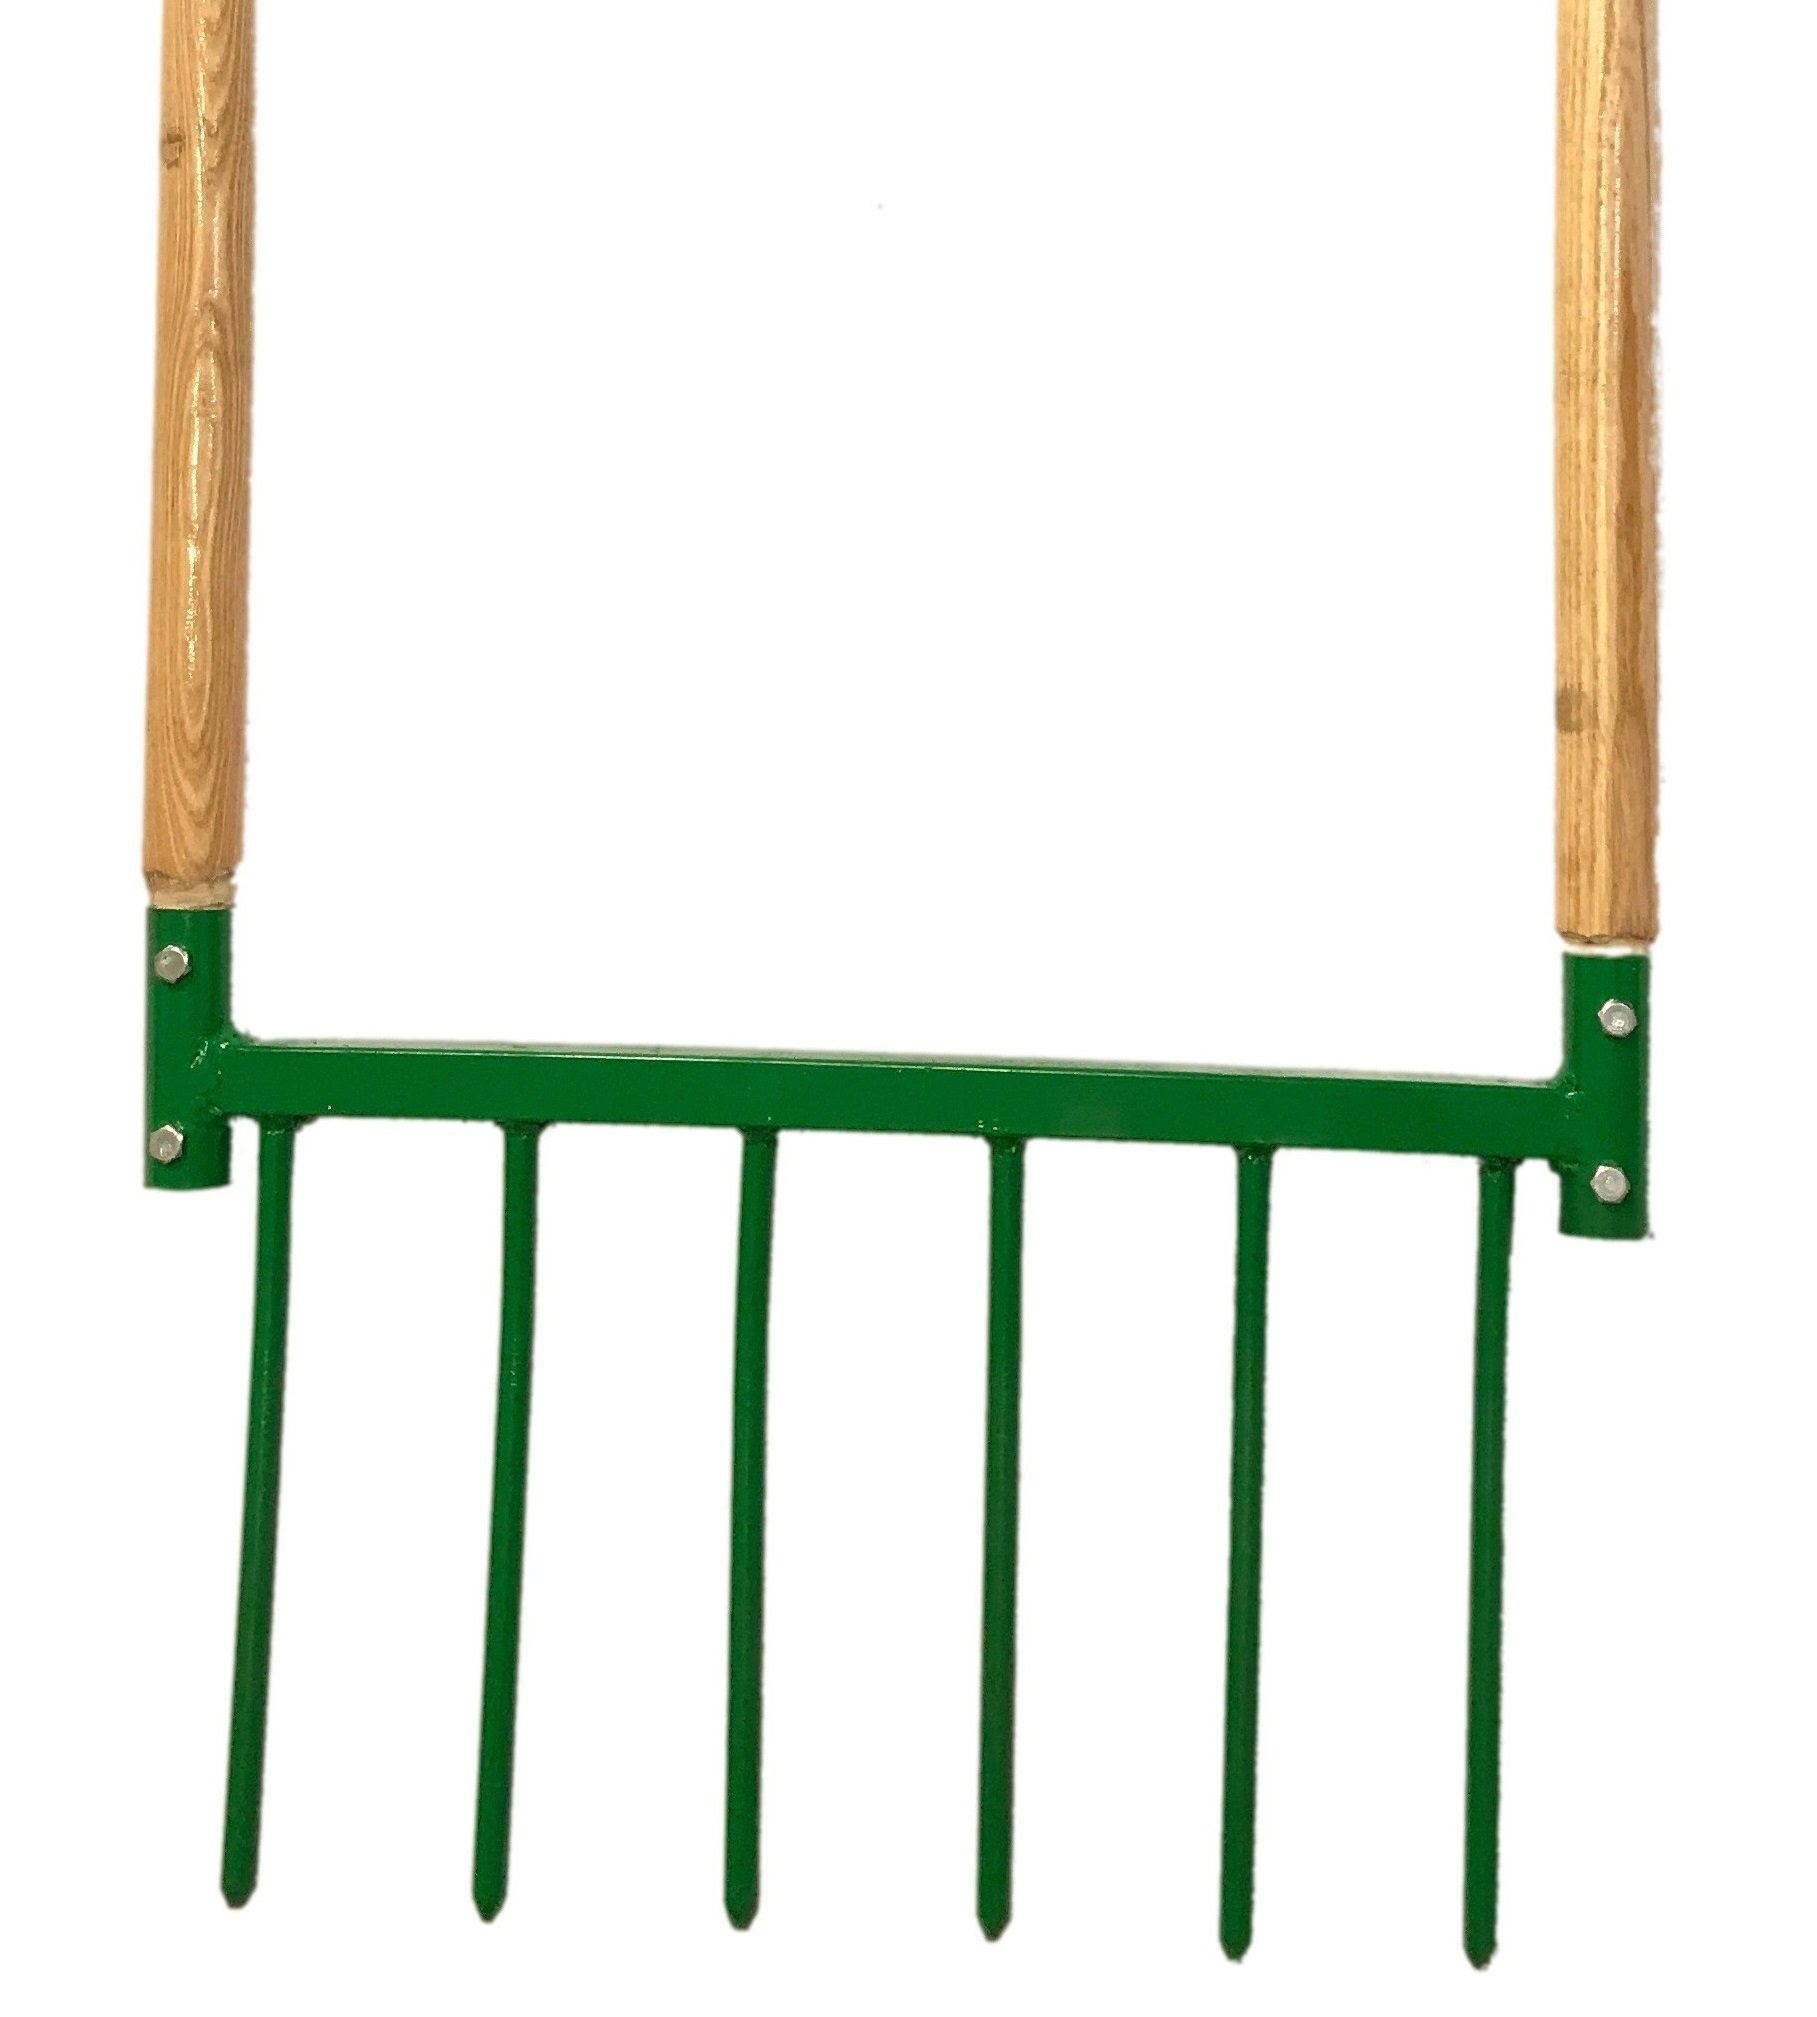 Broadfork Garden Hand Tiller - Wooden Handles, Steel - Aerates, Weeds, and Harvests - Made in U.S.A. with 1/2'' Steel Tines